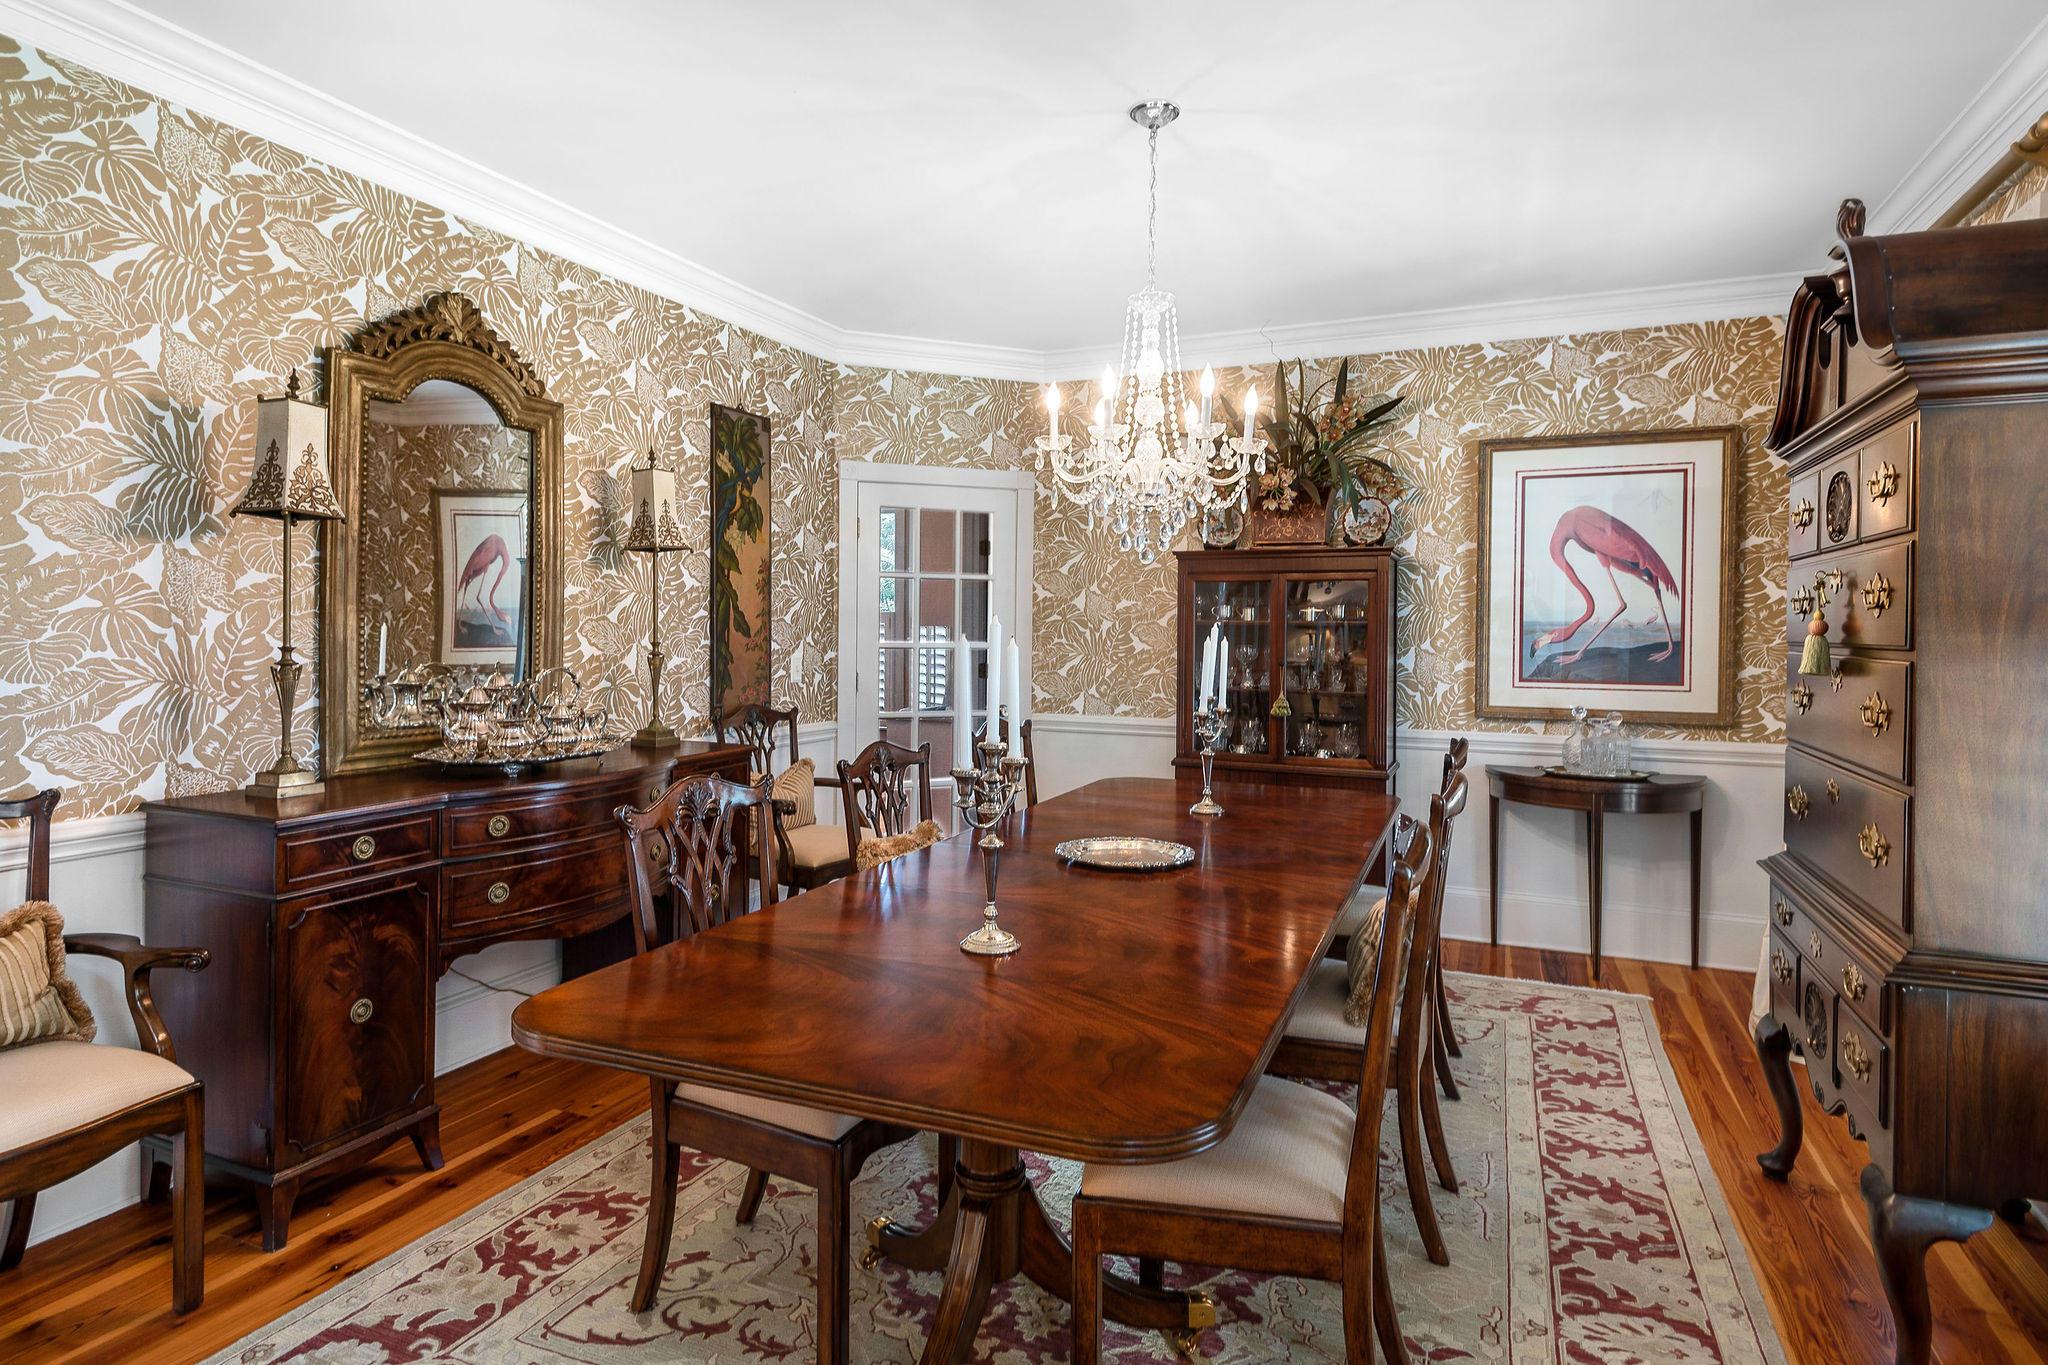 Country Club II Homes For Sale - 1482 Burningtree, Charleston, SC - 57